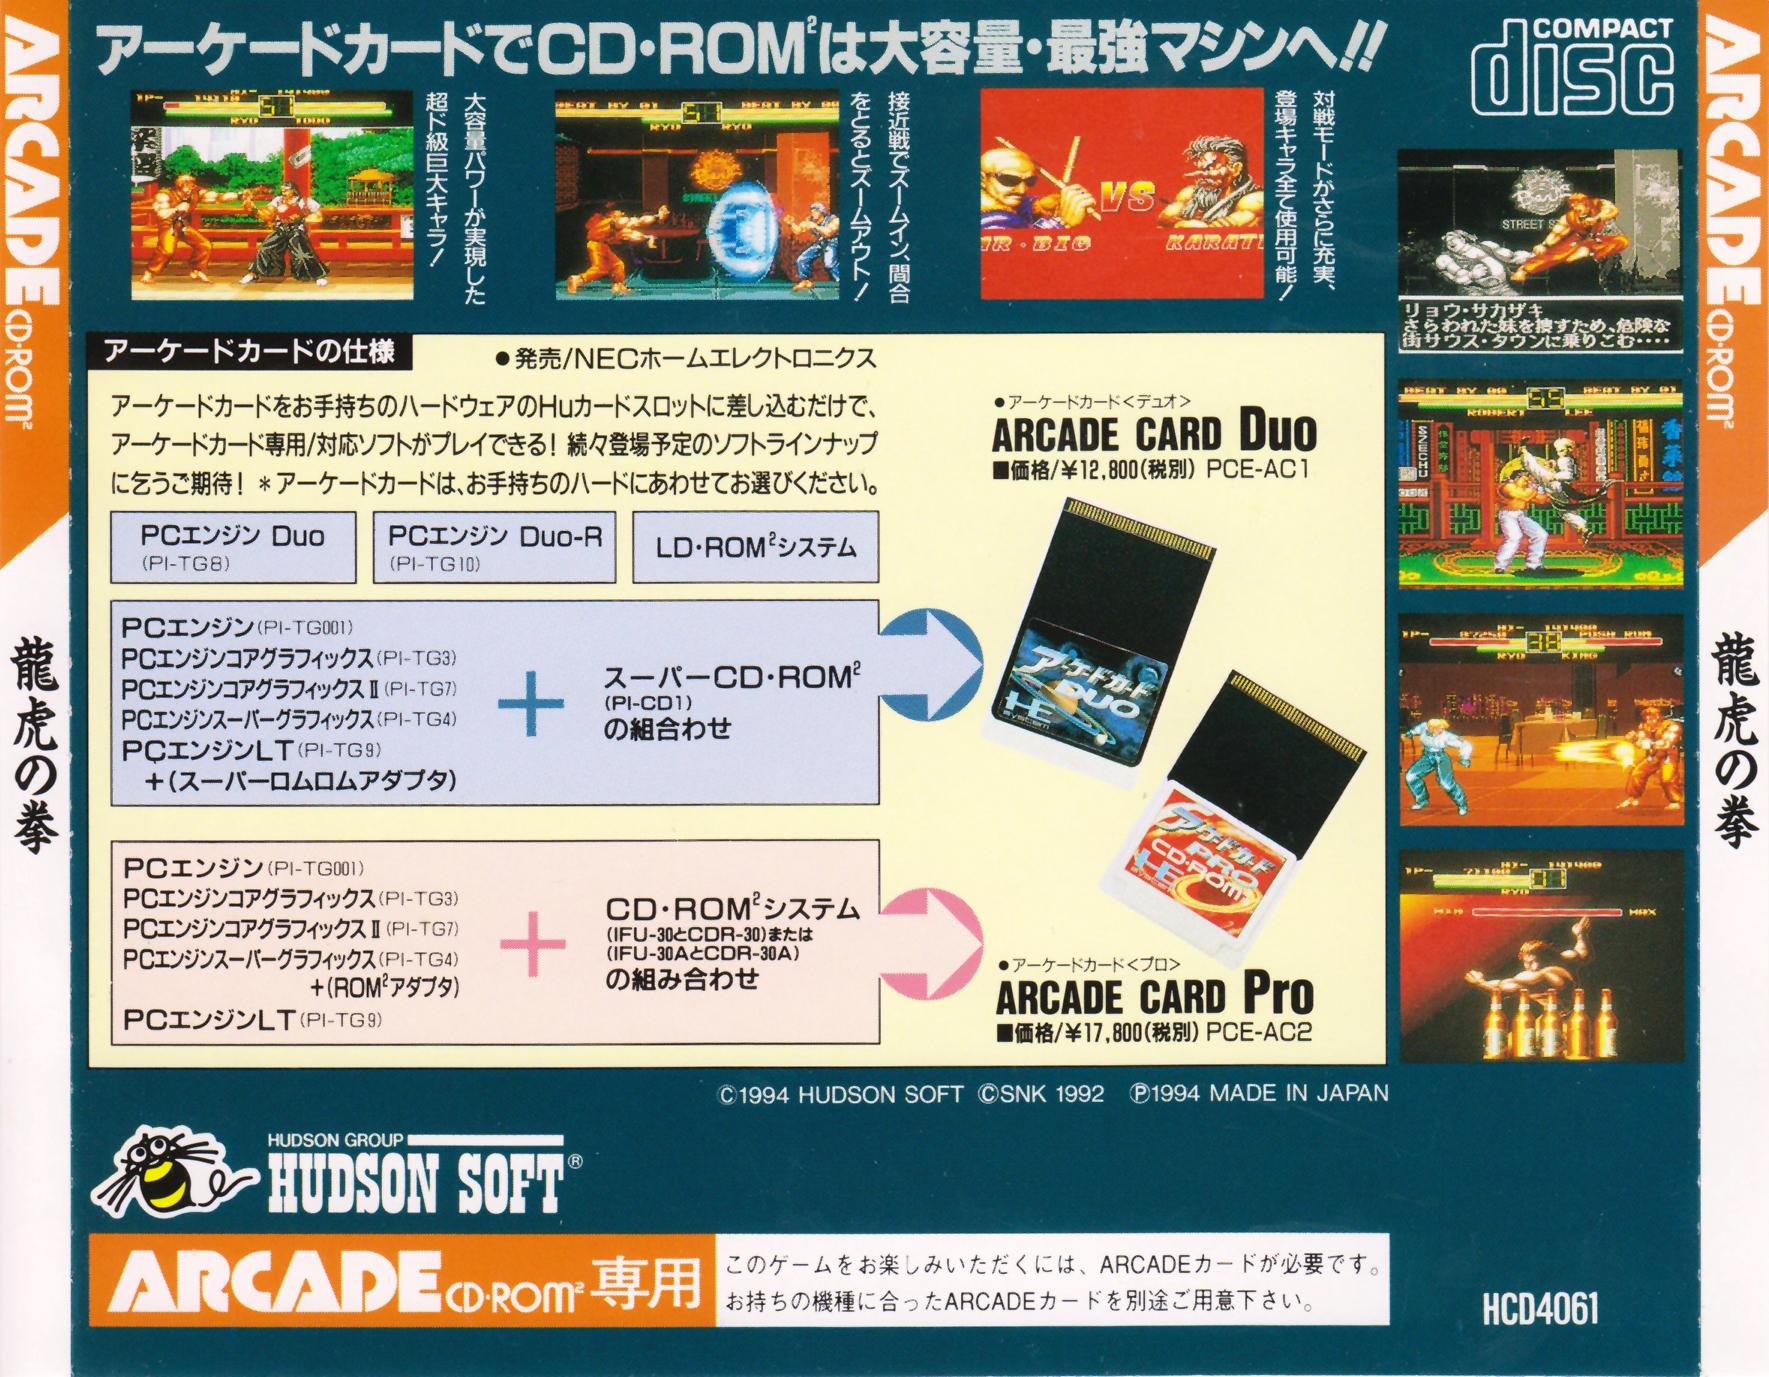 Ryūko no Ken / Art of Fighting - The PC Engine Software Bible